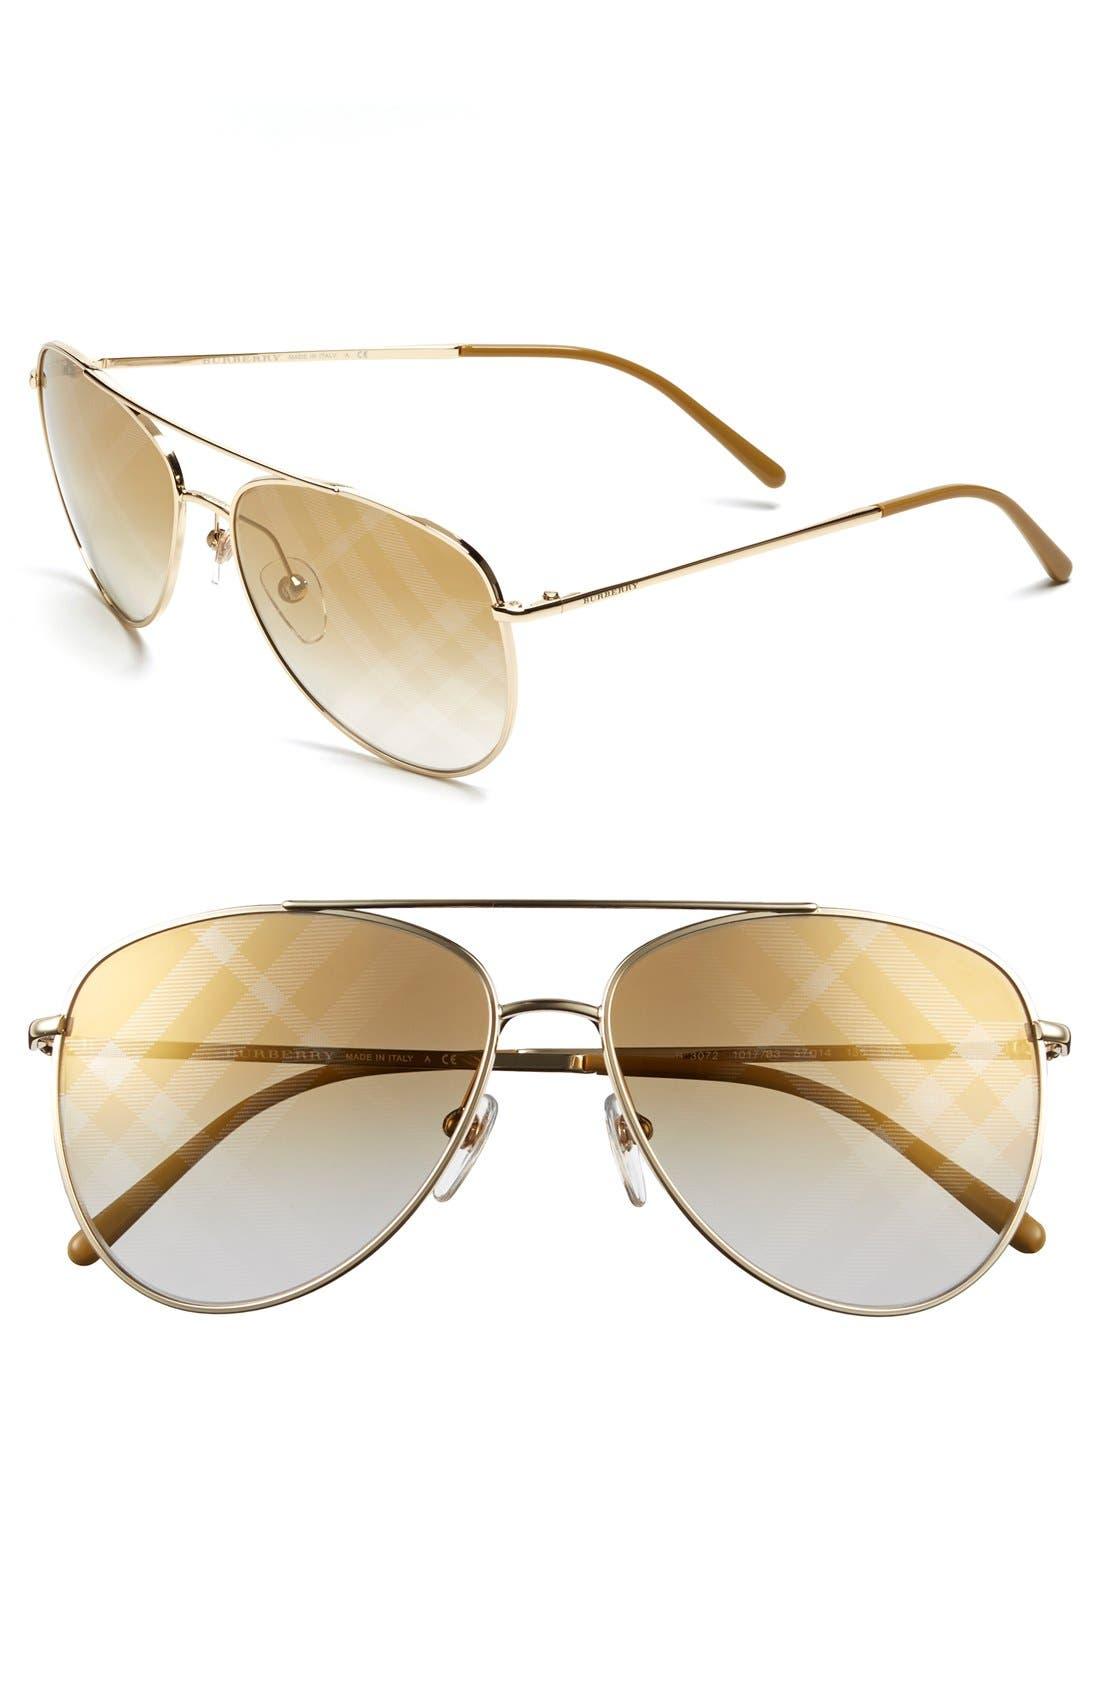 Alternate Image 1 Selected - Burberry 57mm Aviator Sunglasses